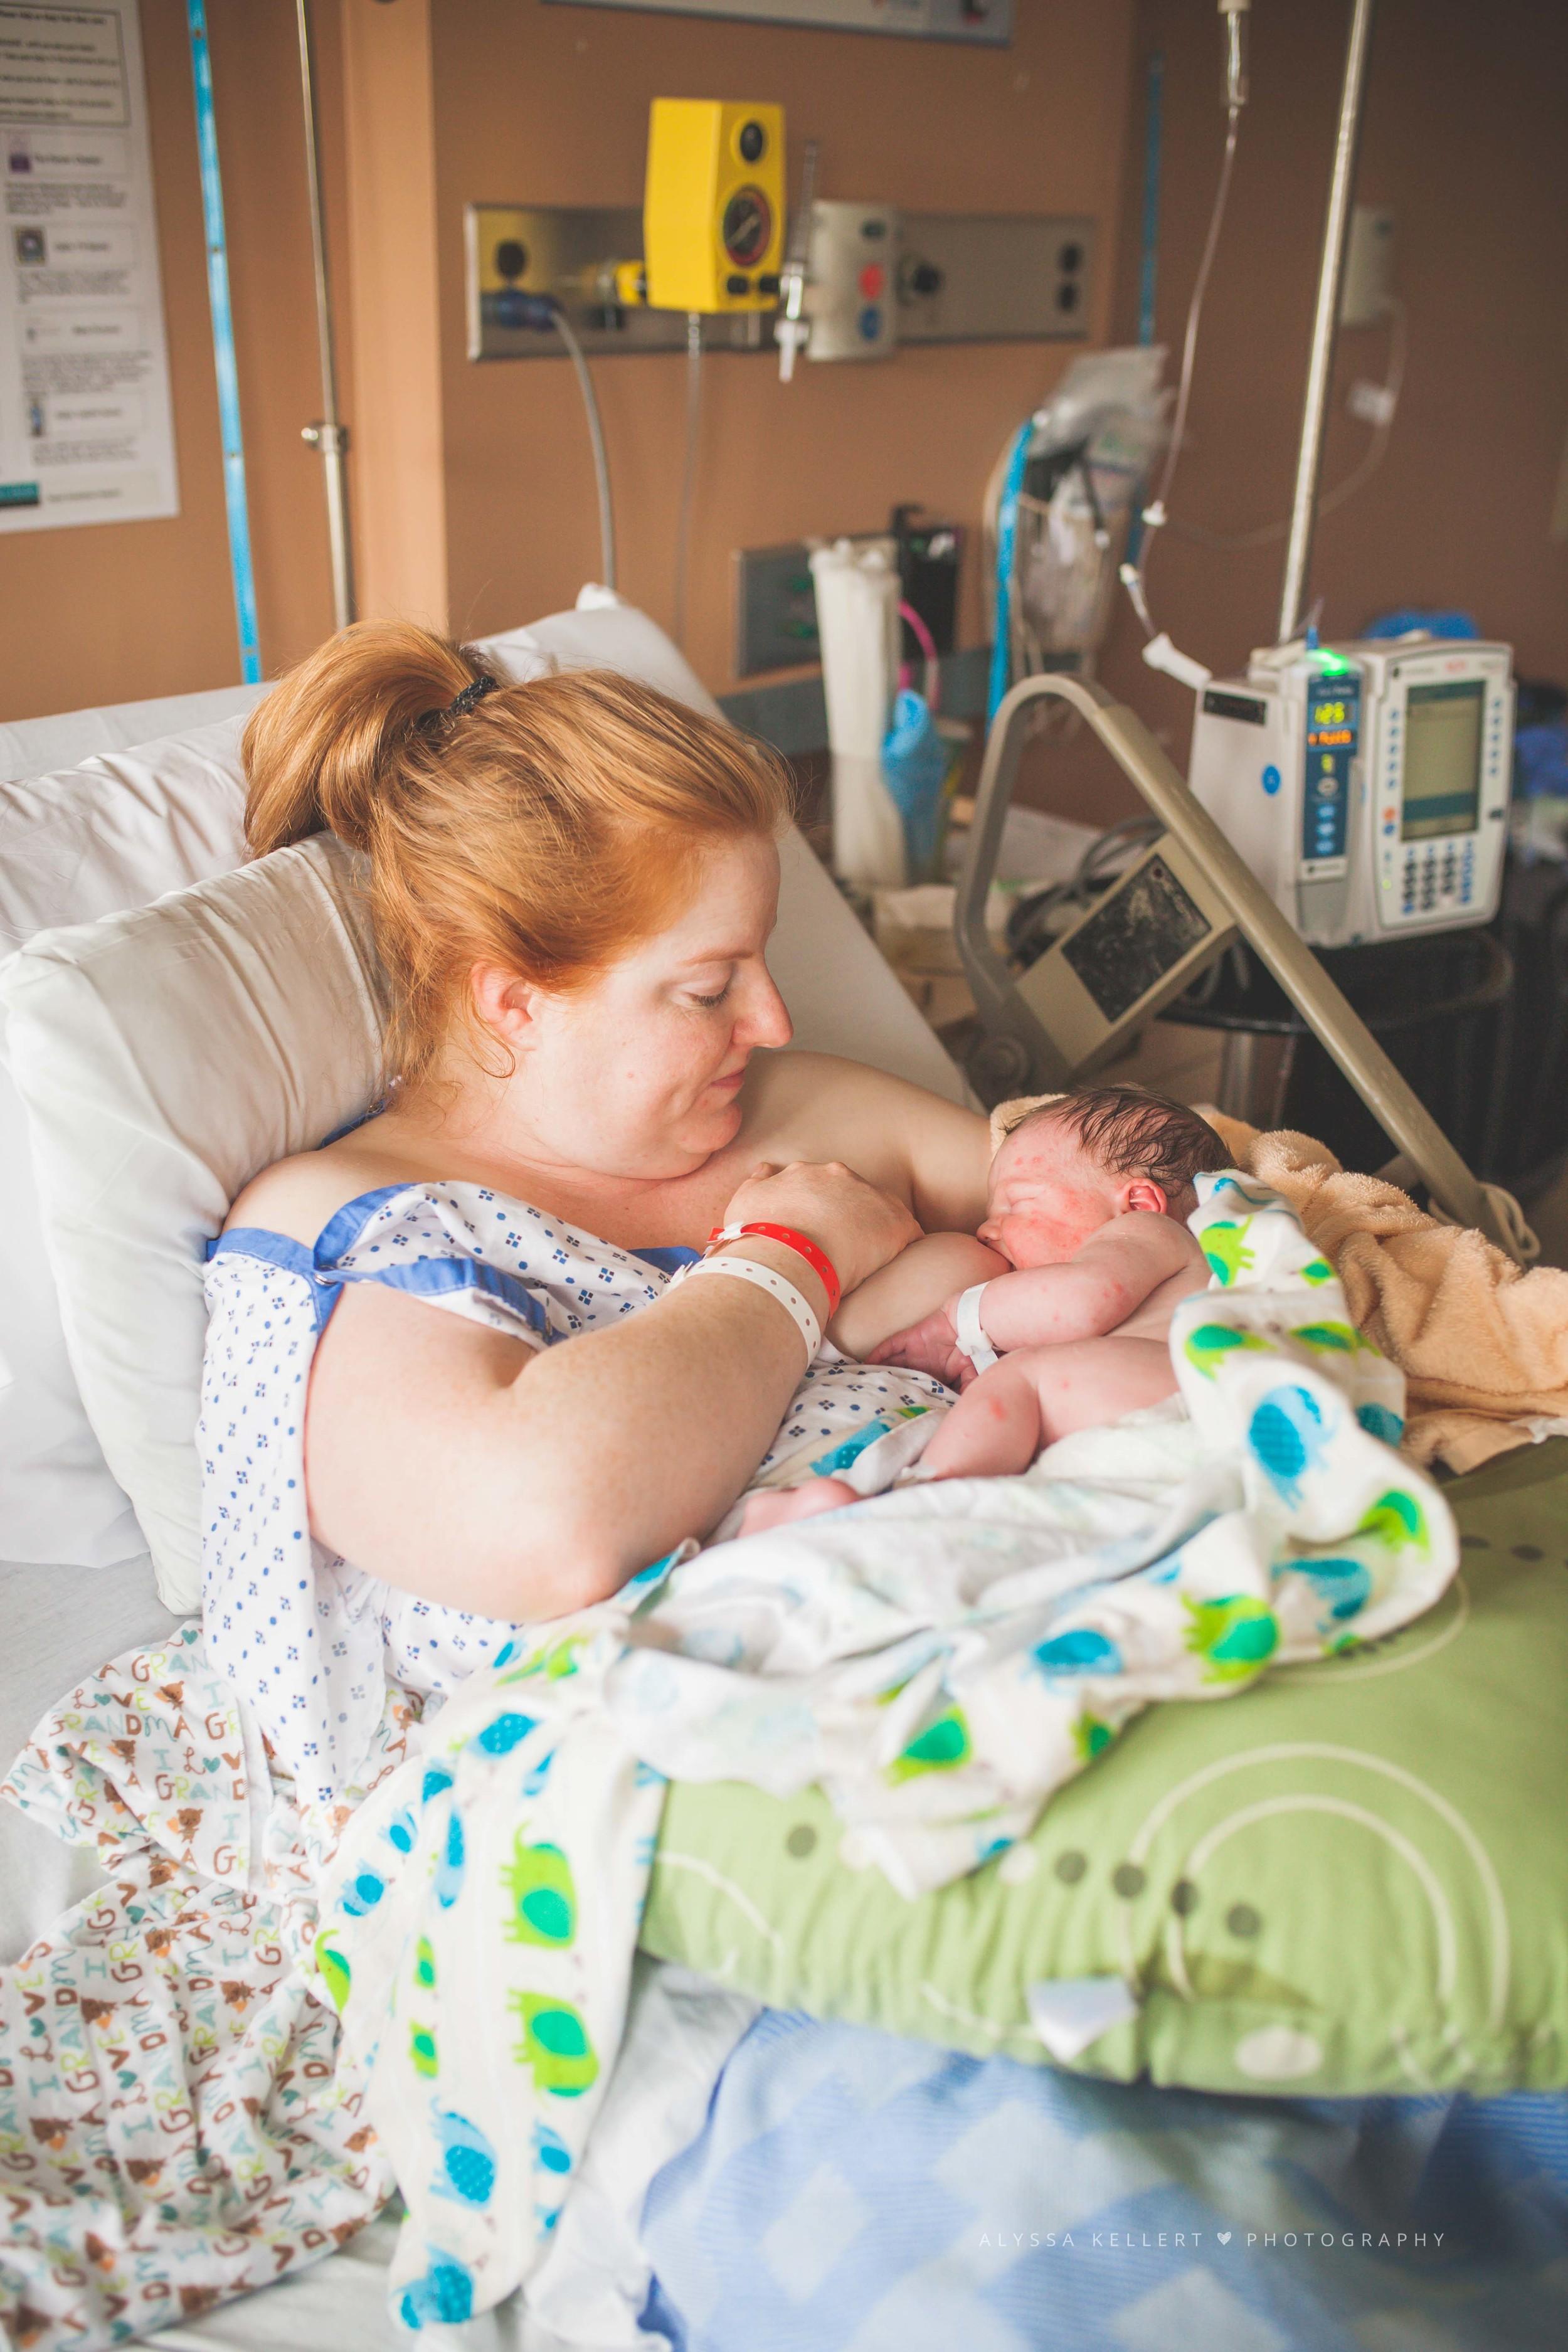 newborn-fresh-48-royal-columbian-hospital-baby-sister-meet-newborn-photography-photographer-newwest-coquitlam-vancouver-nursing-breastfeeding